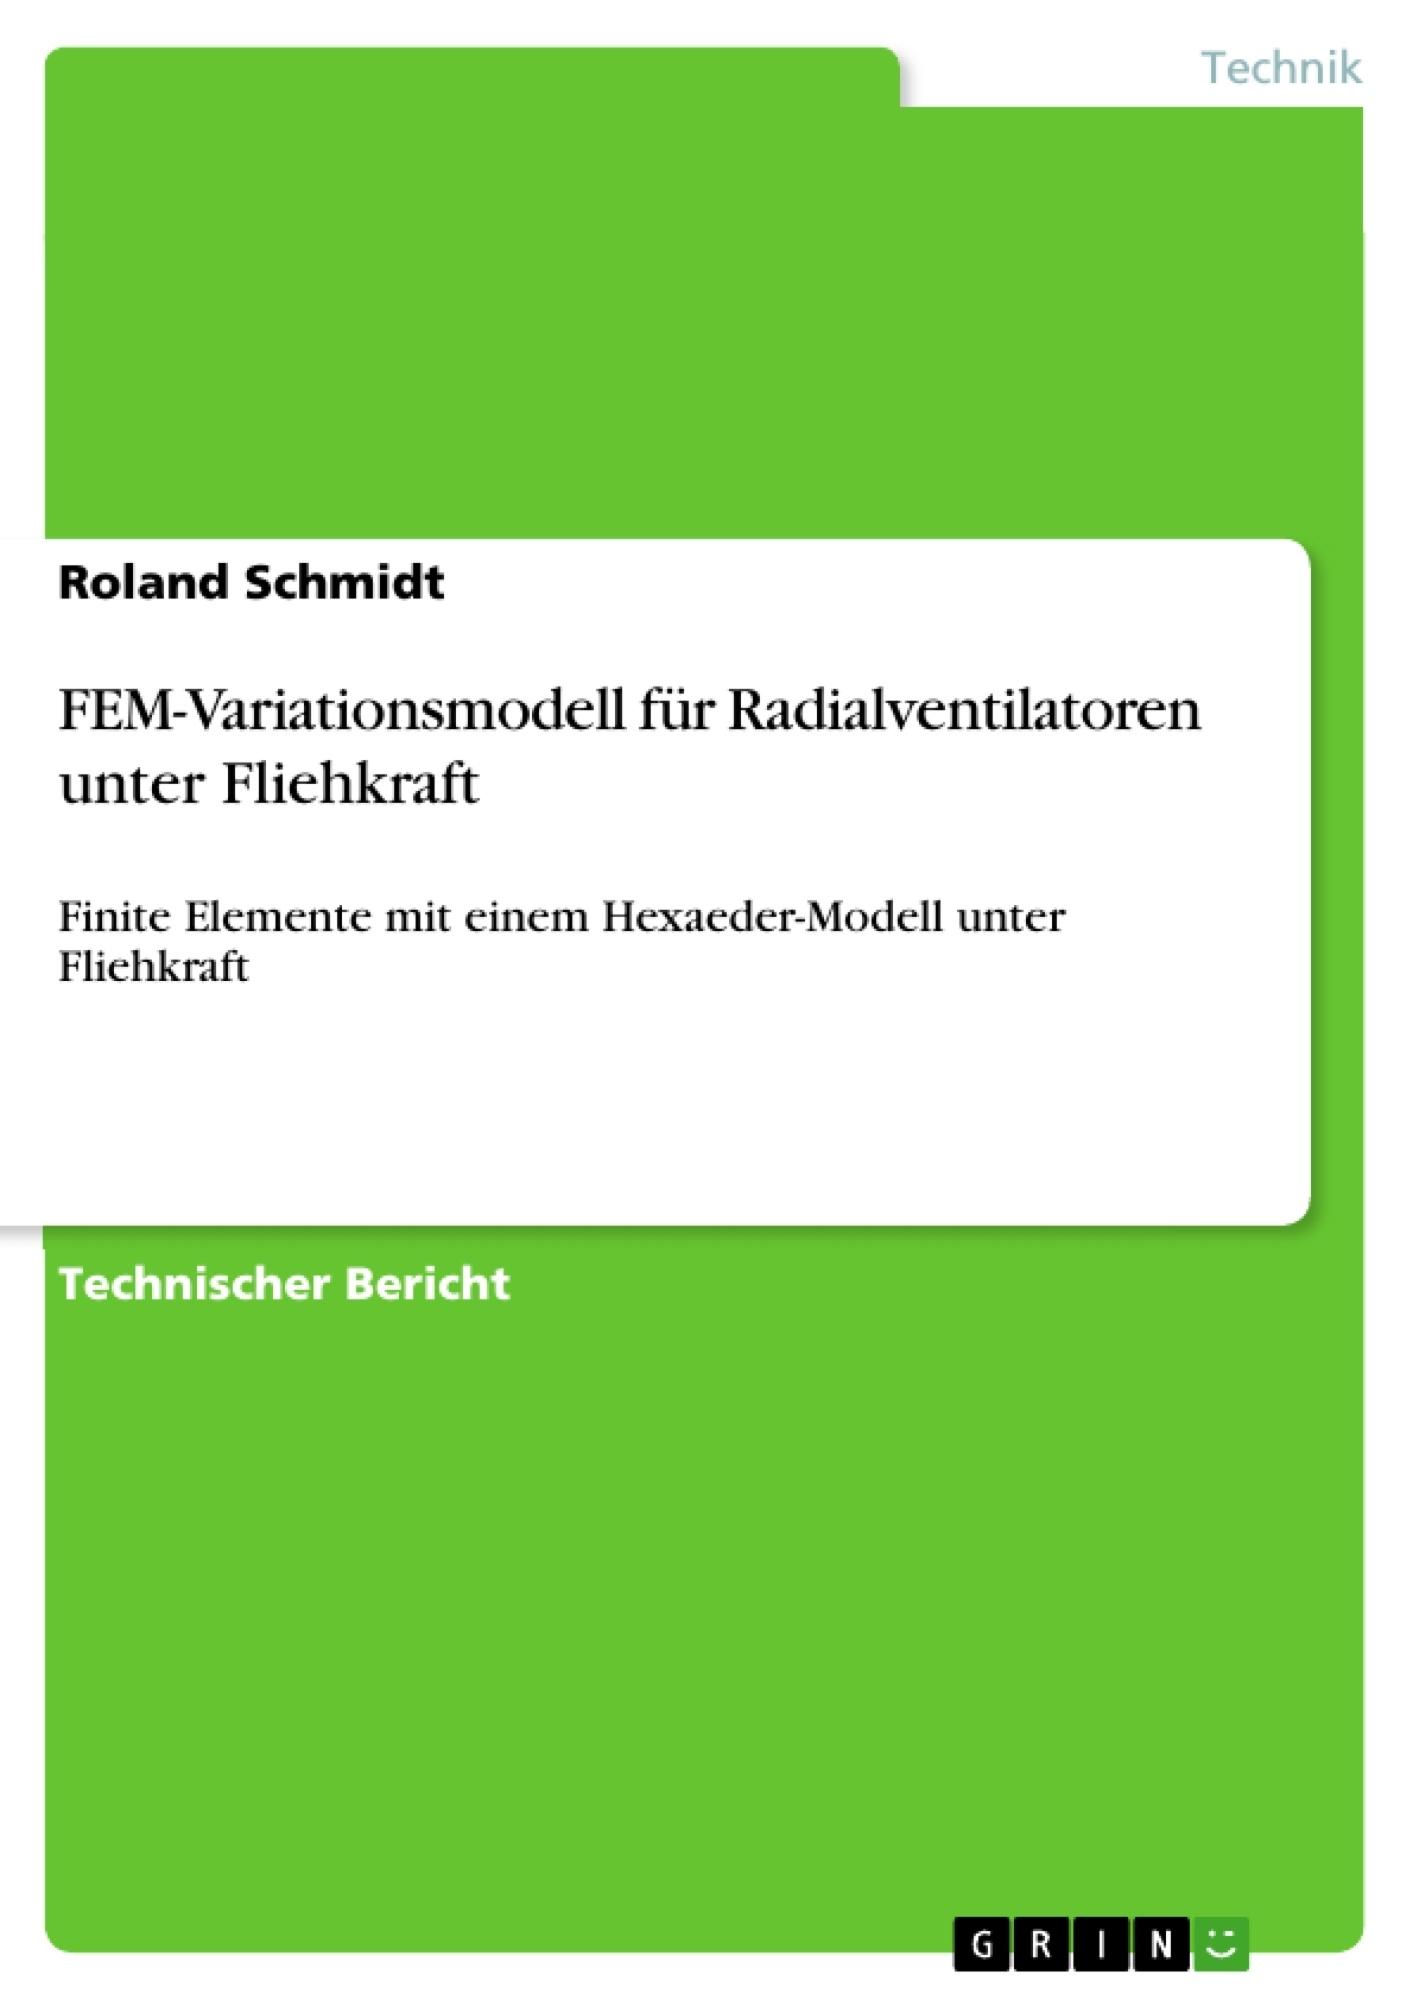 Titel: FEM-Variationsmodell für Radialventilatoren unter Fliehkraft